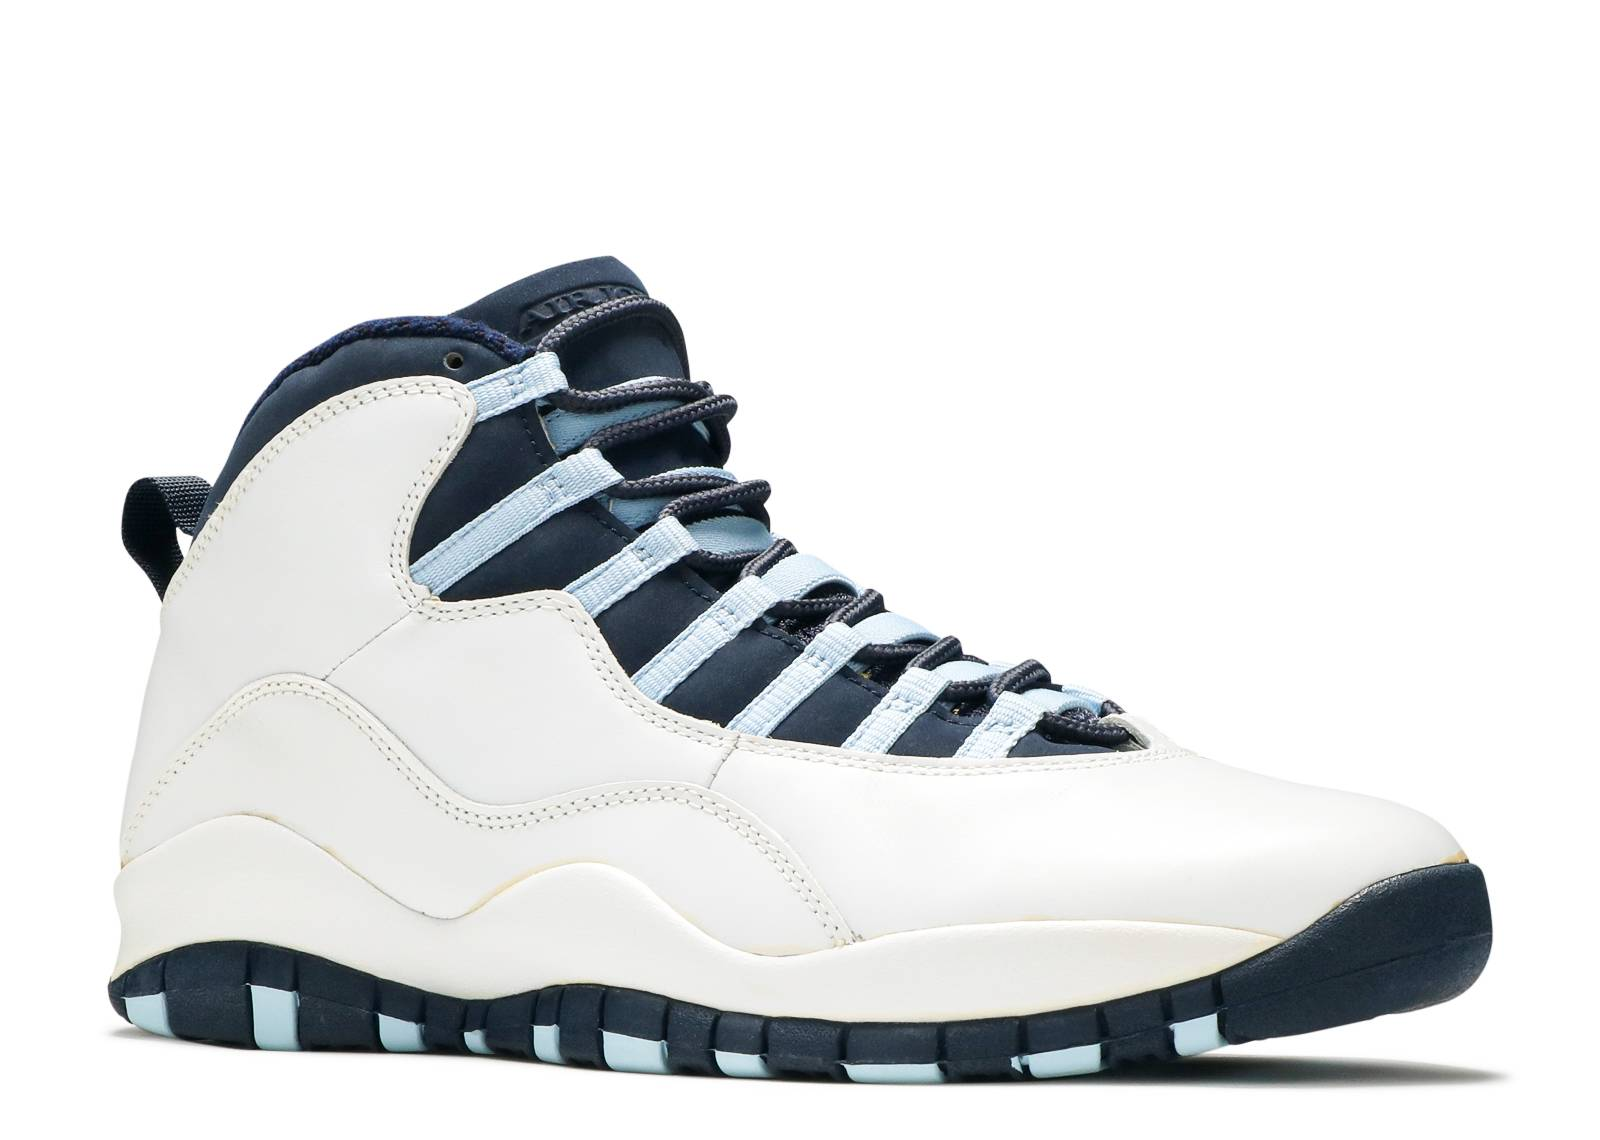 buy online 067f1 8fe41 red and blue jordan 10